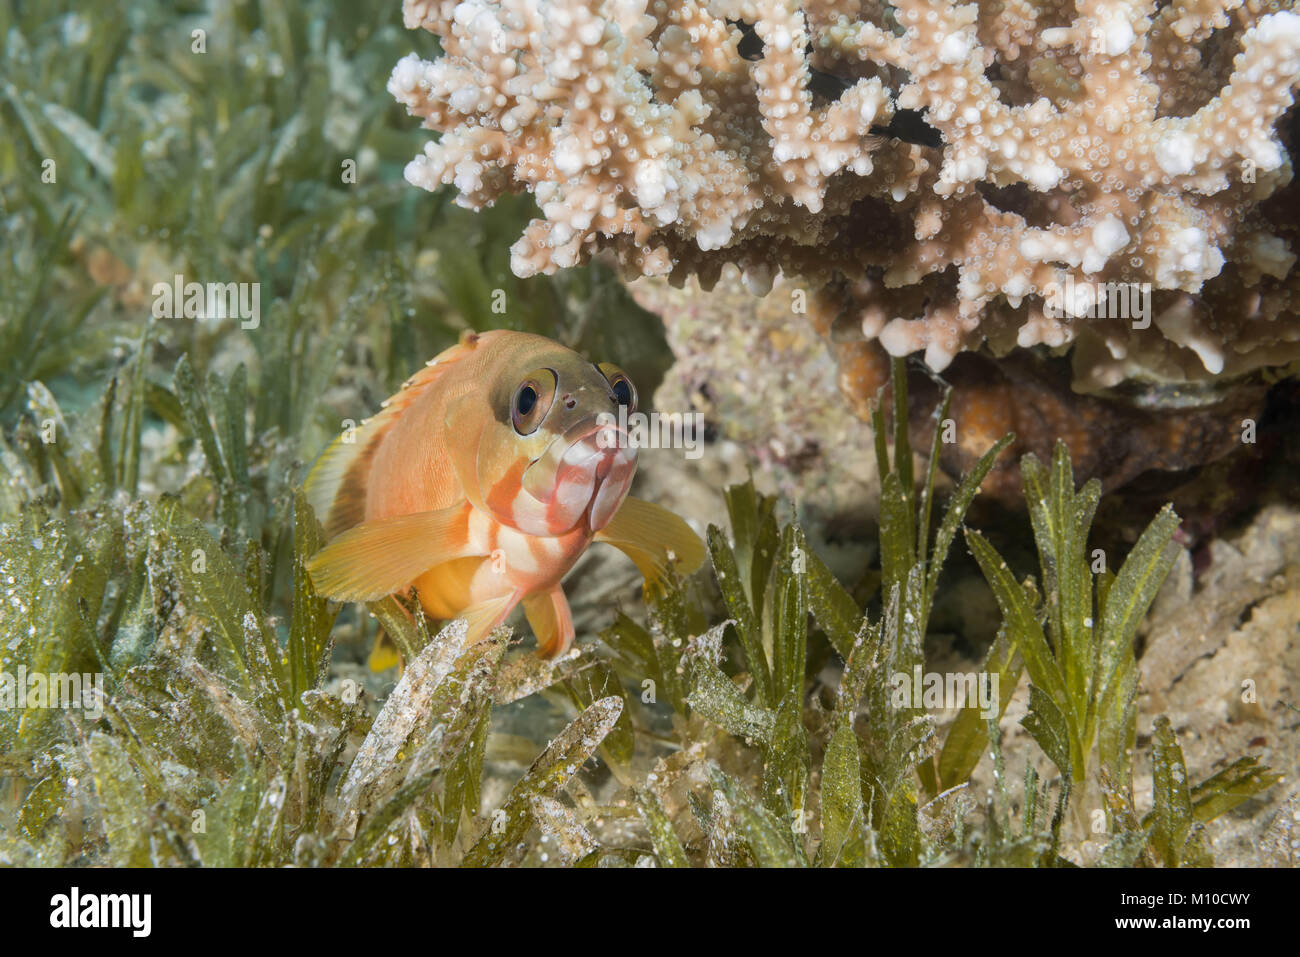 Red Sea, Dahab, Egypt. 14th Nov, 2017. Blacktip Grouper (Epinephelus fasciatus) lies on the sea grass under coral Stock Photo